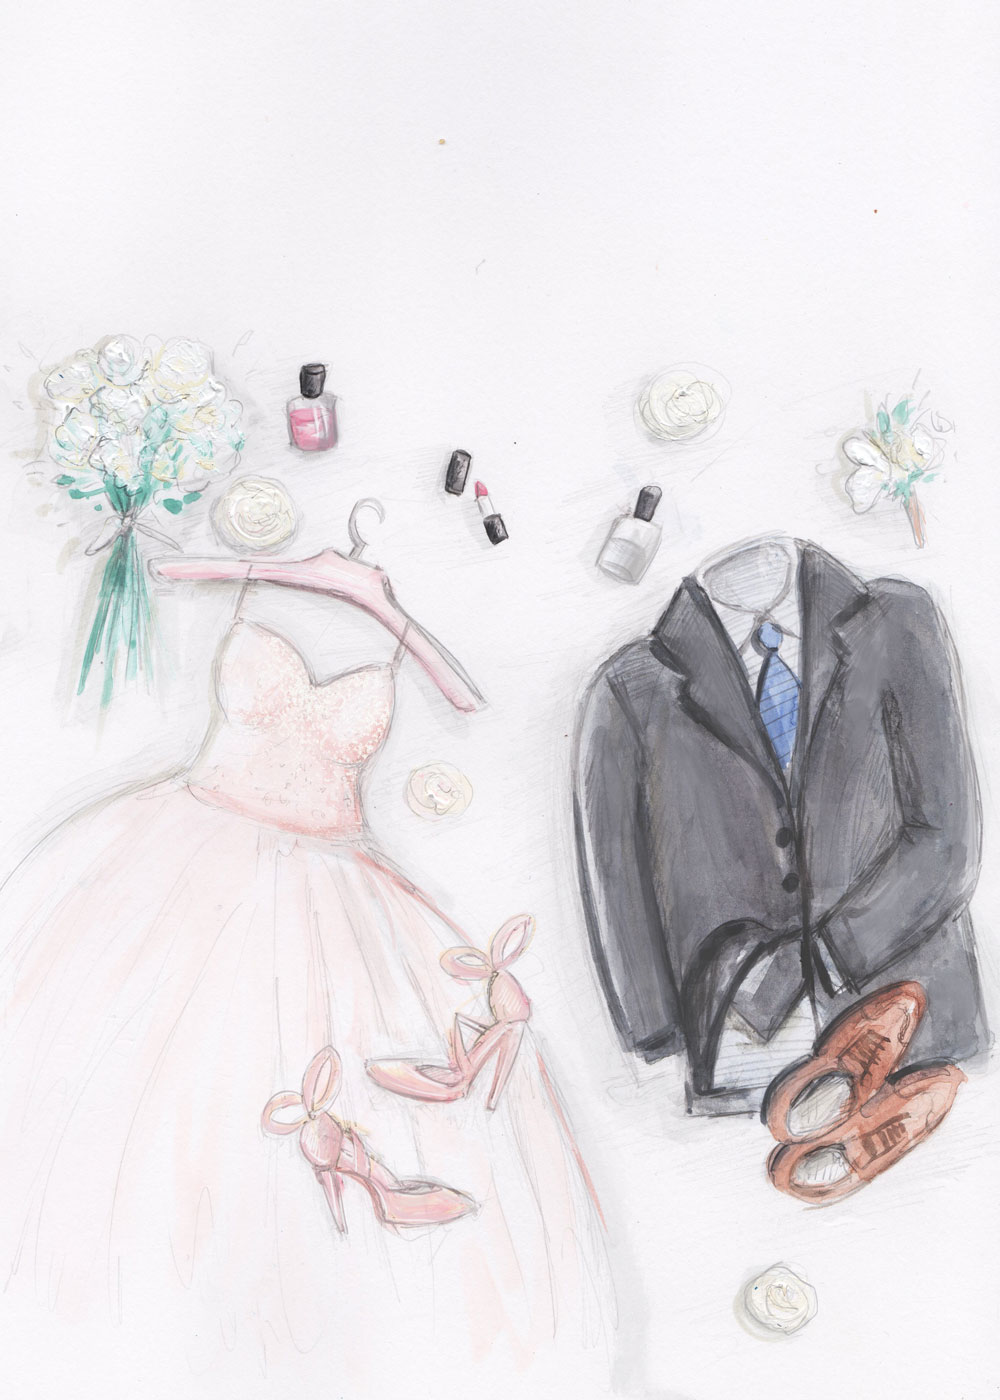 I do: fashion illustration - acrylic paint, watercolour and digital finish